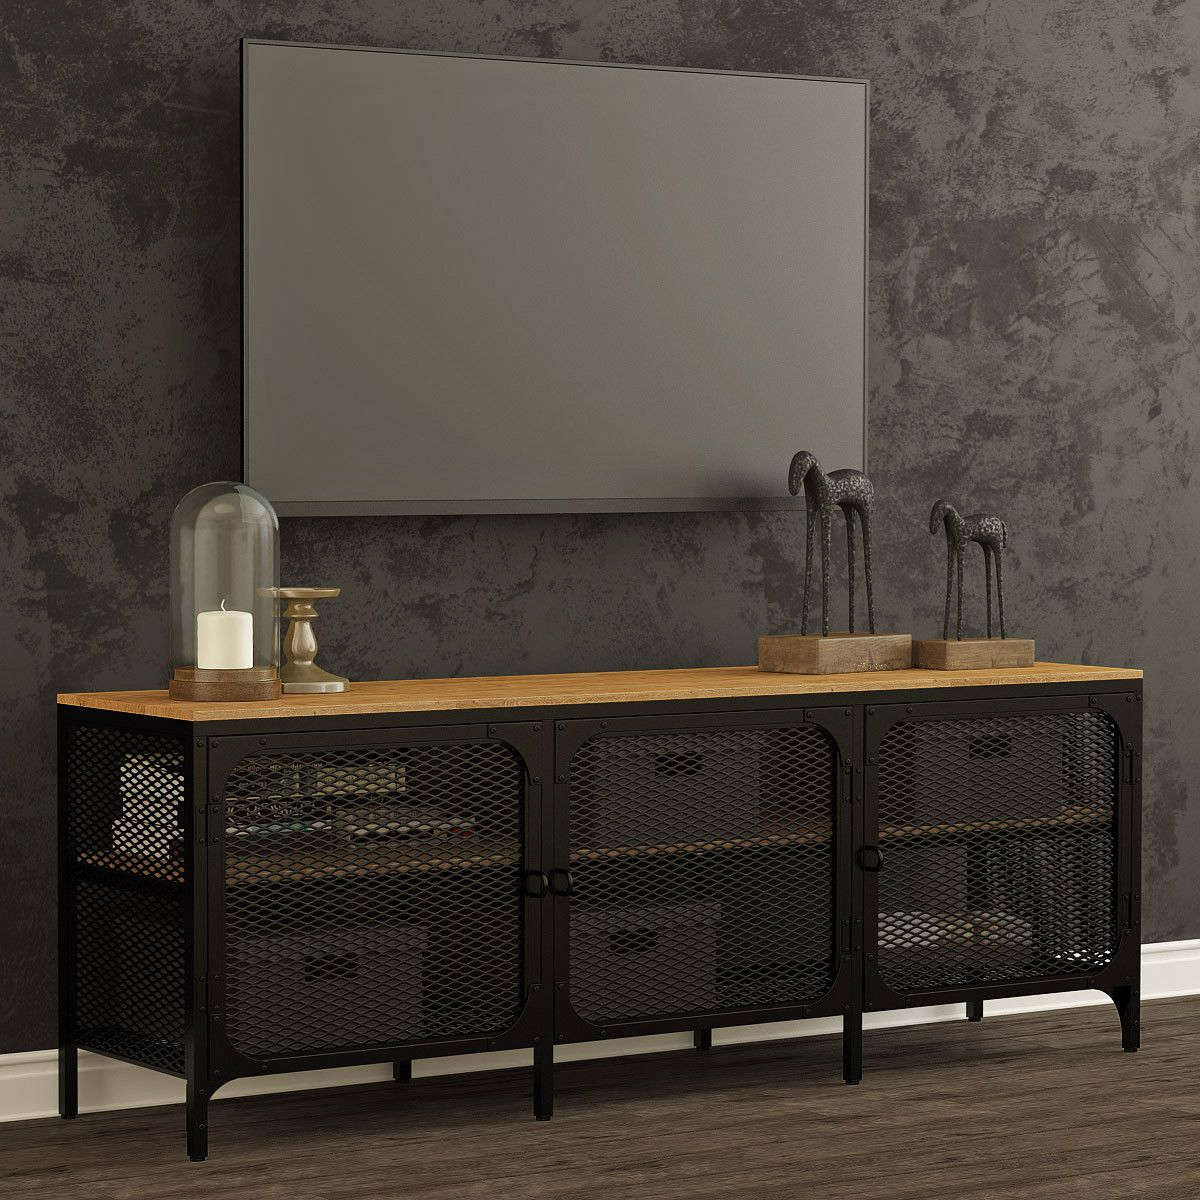 3d Tv Bench Fjallbo 3d Model Diy For The Home In 2019